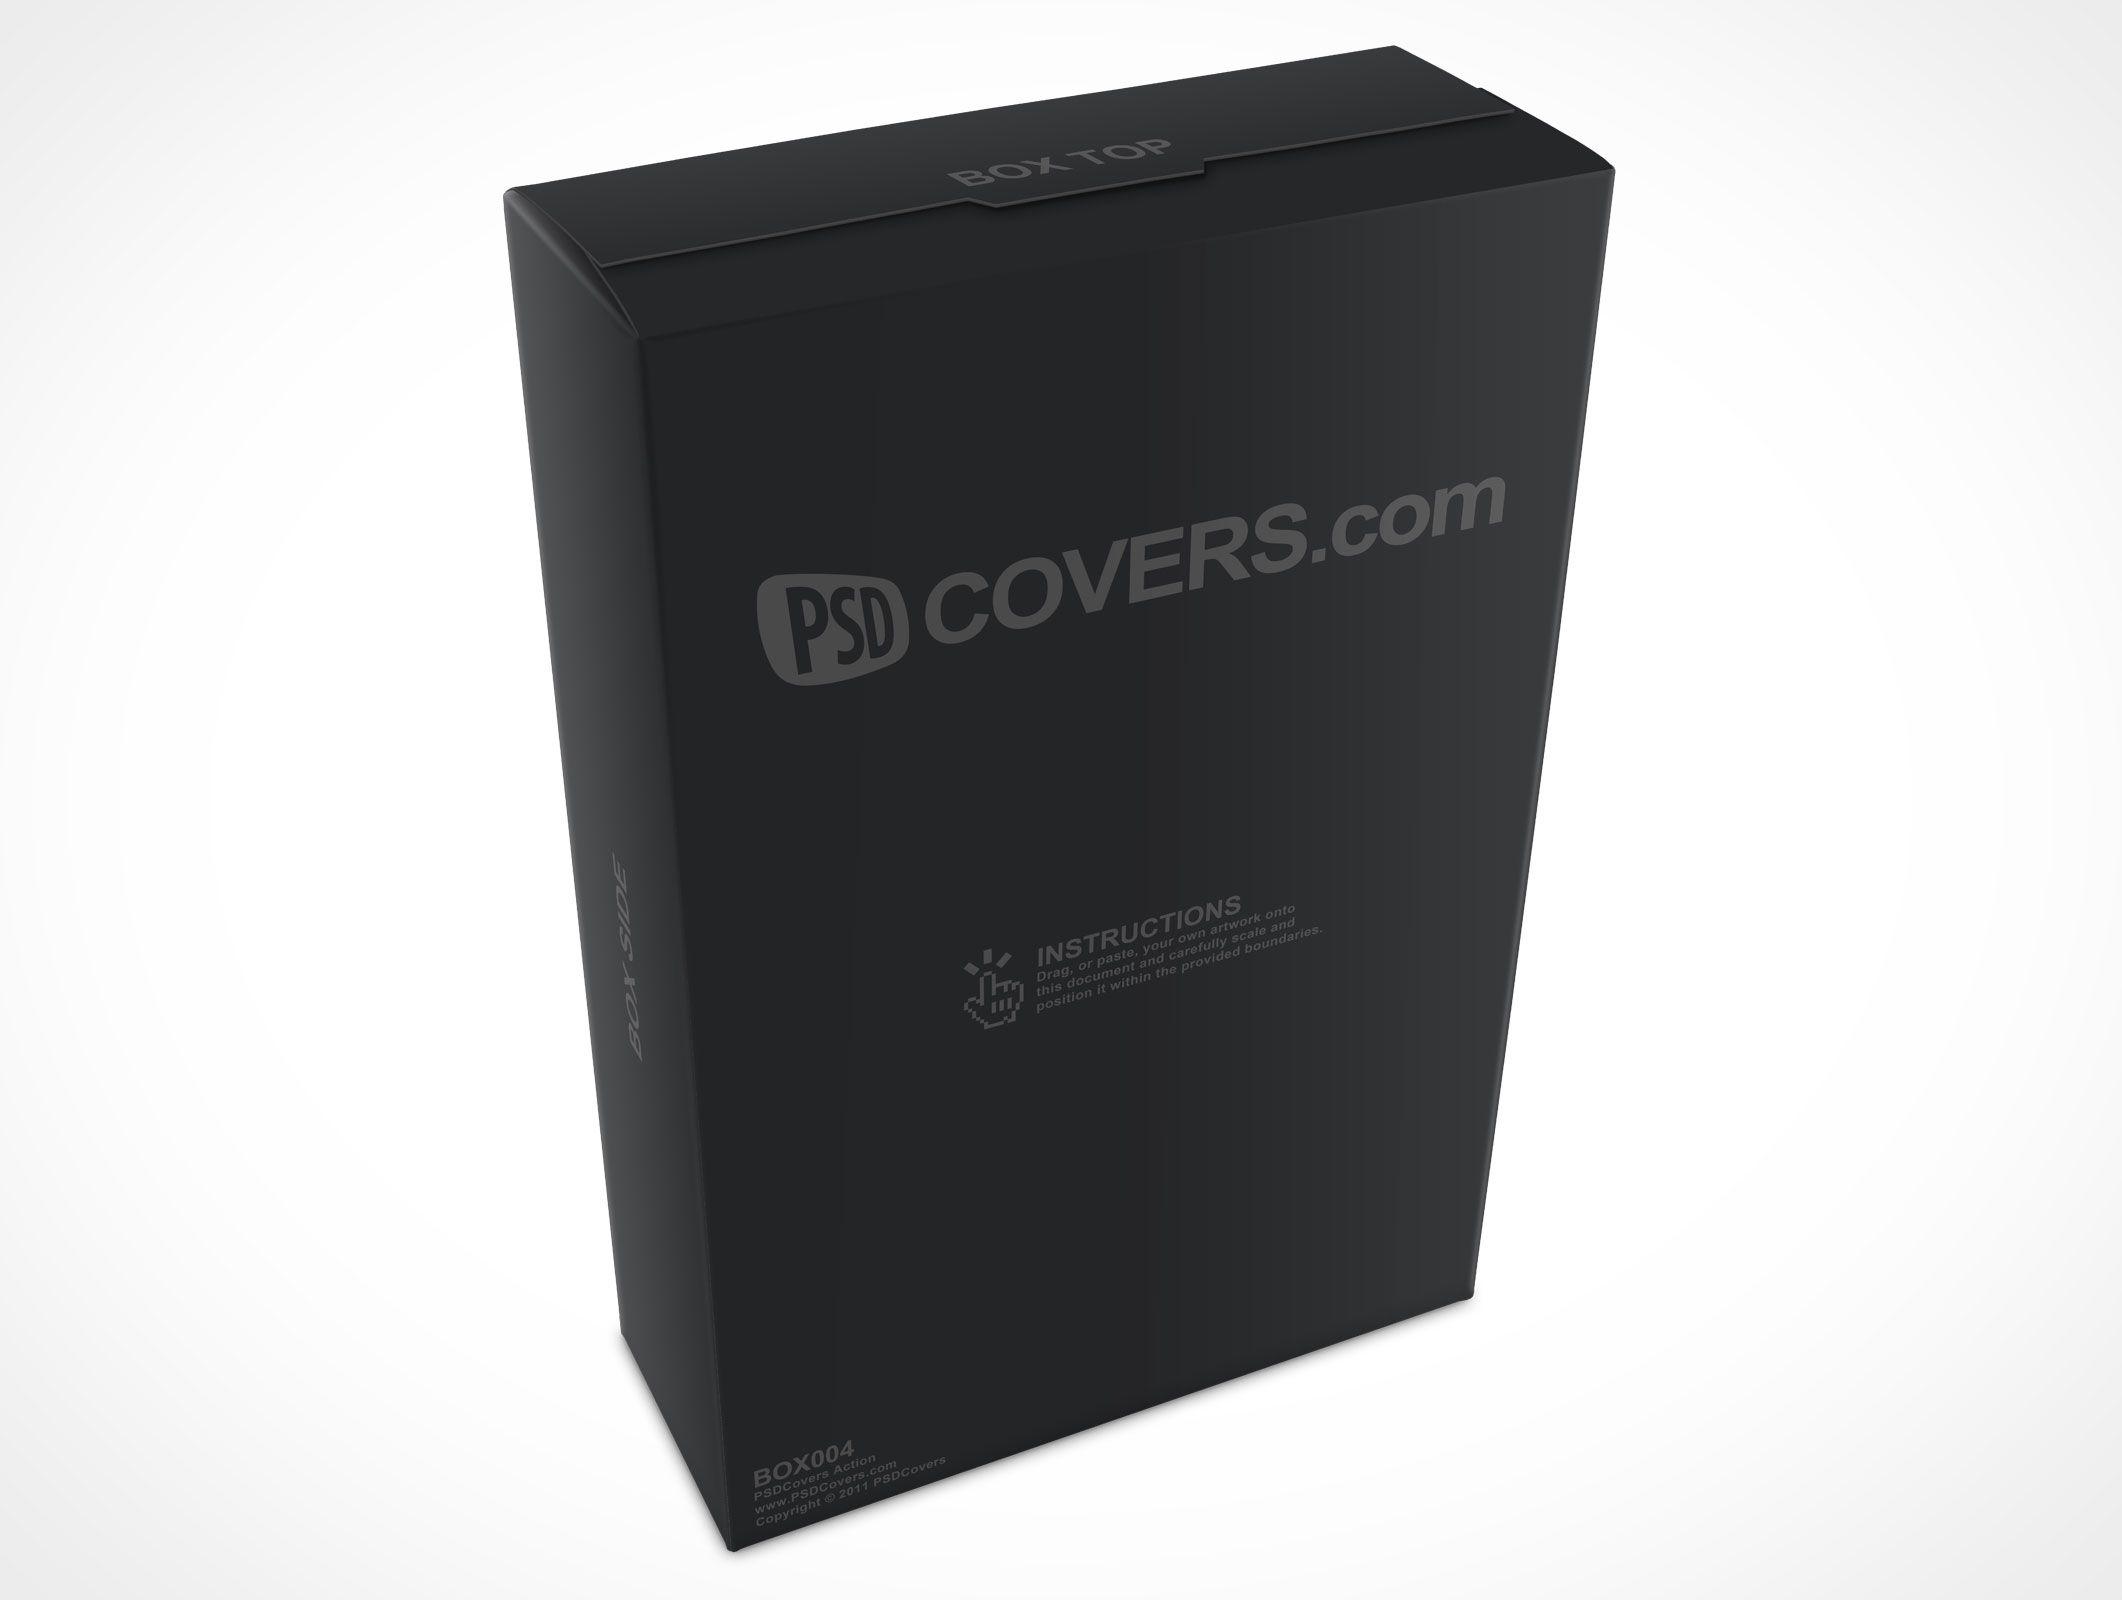 Download Box004 Market Your Psd Mockups For Box Psd Mockup Psd Design Freebie